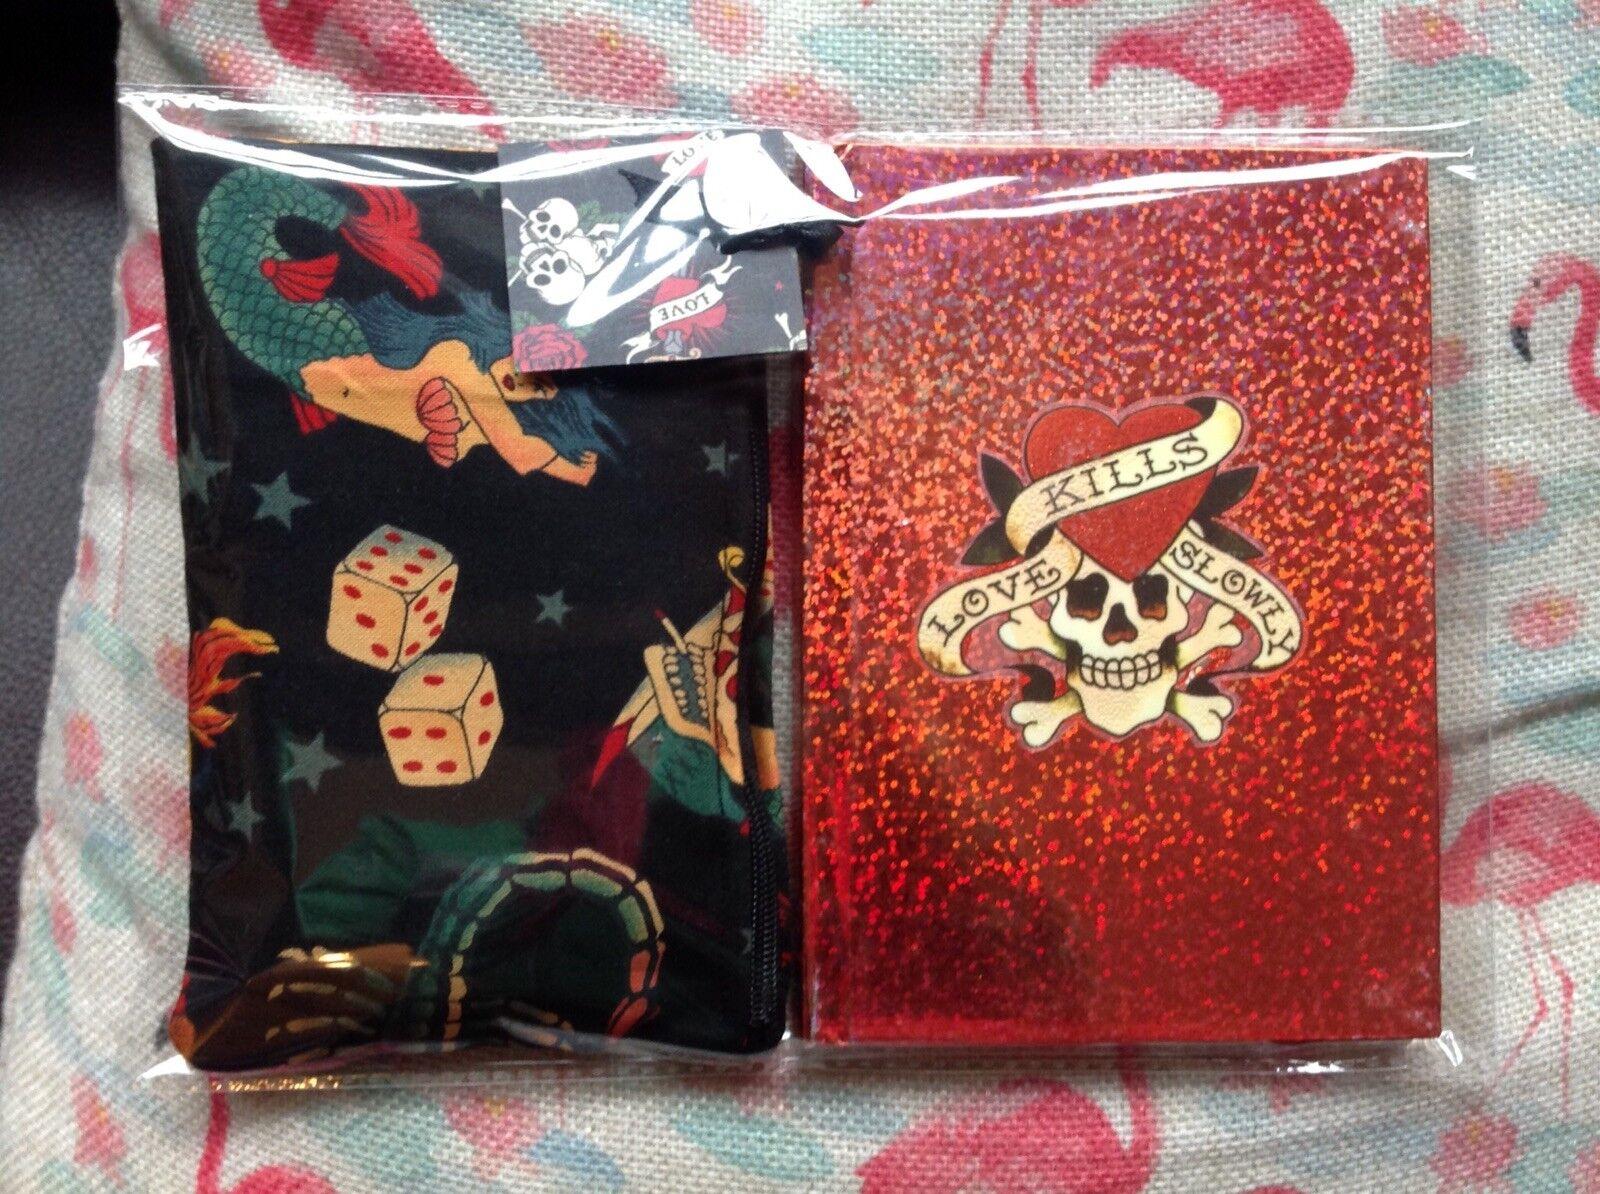 Rockabilly Tattoo Cosmetic Bag +Hardback Notebook Ed Hardy Inspired 2pc Gift Set